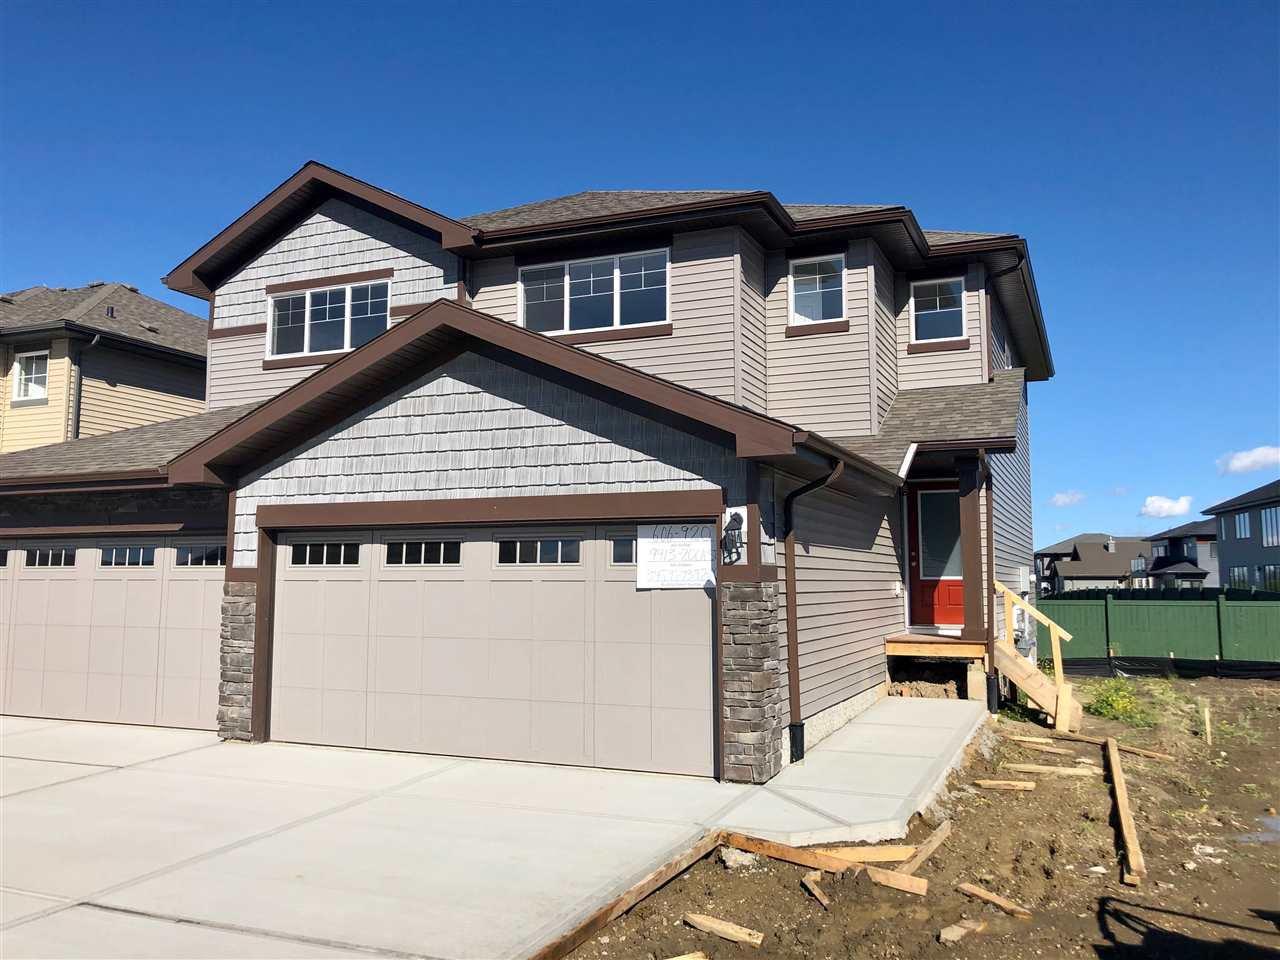 Main Photo: 9413 206A Street in Edmonton: Zone 58 House Half Duplex for sale : MLS®# E4211512